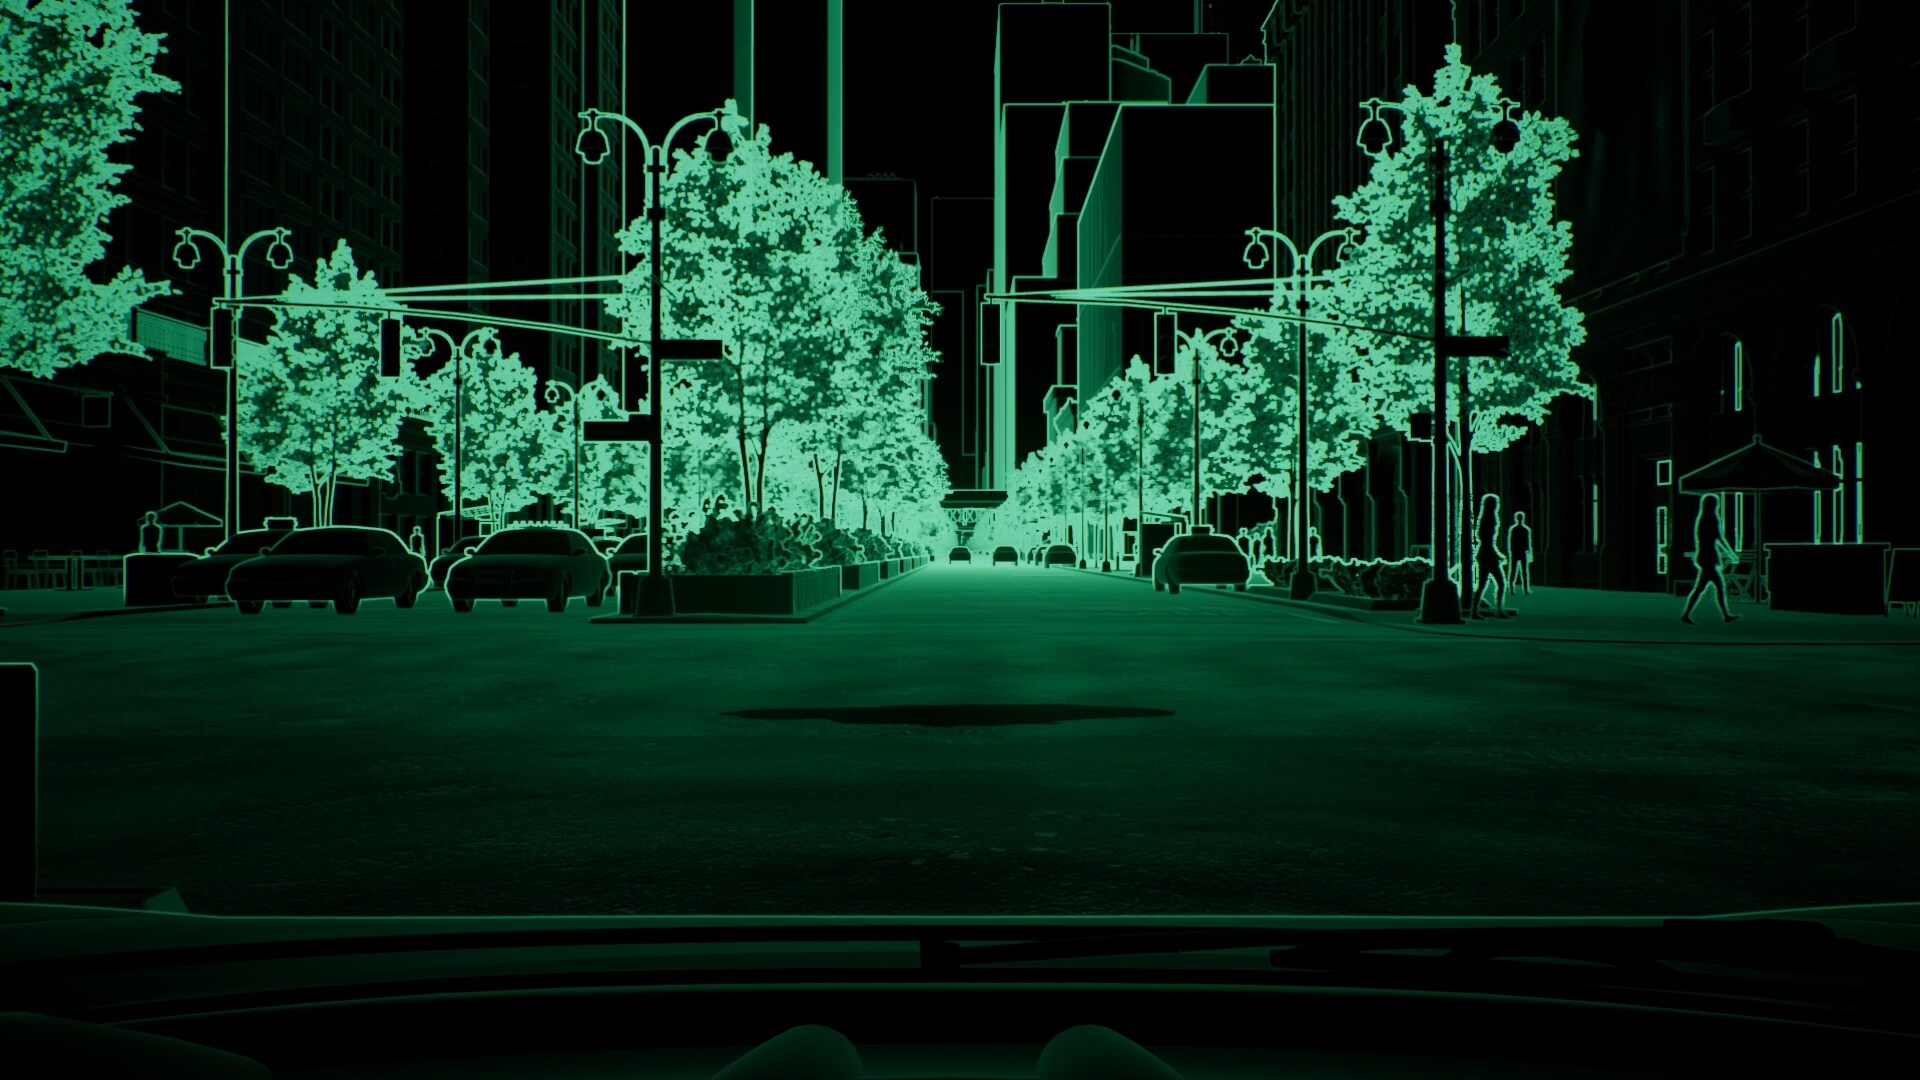 city-3.jpg